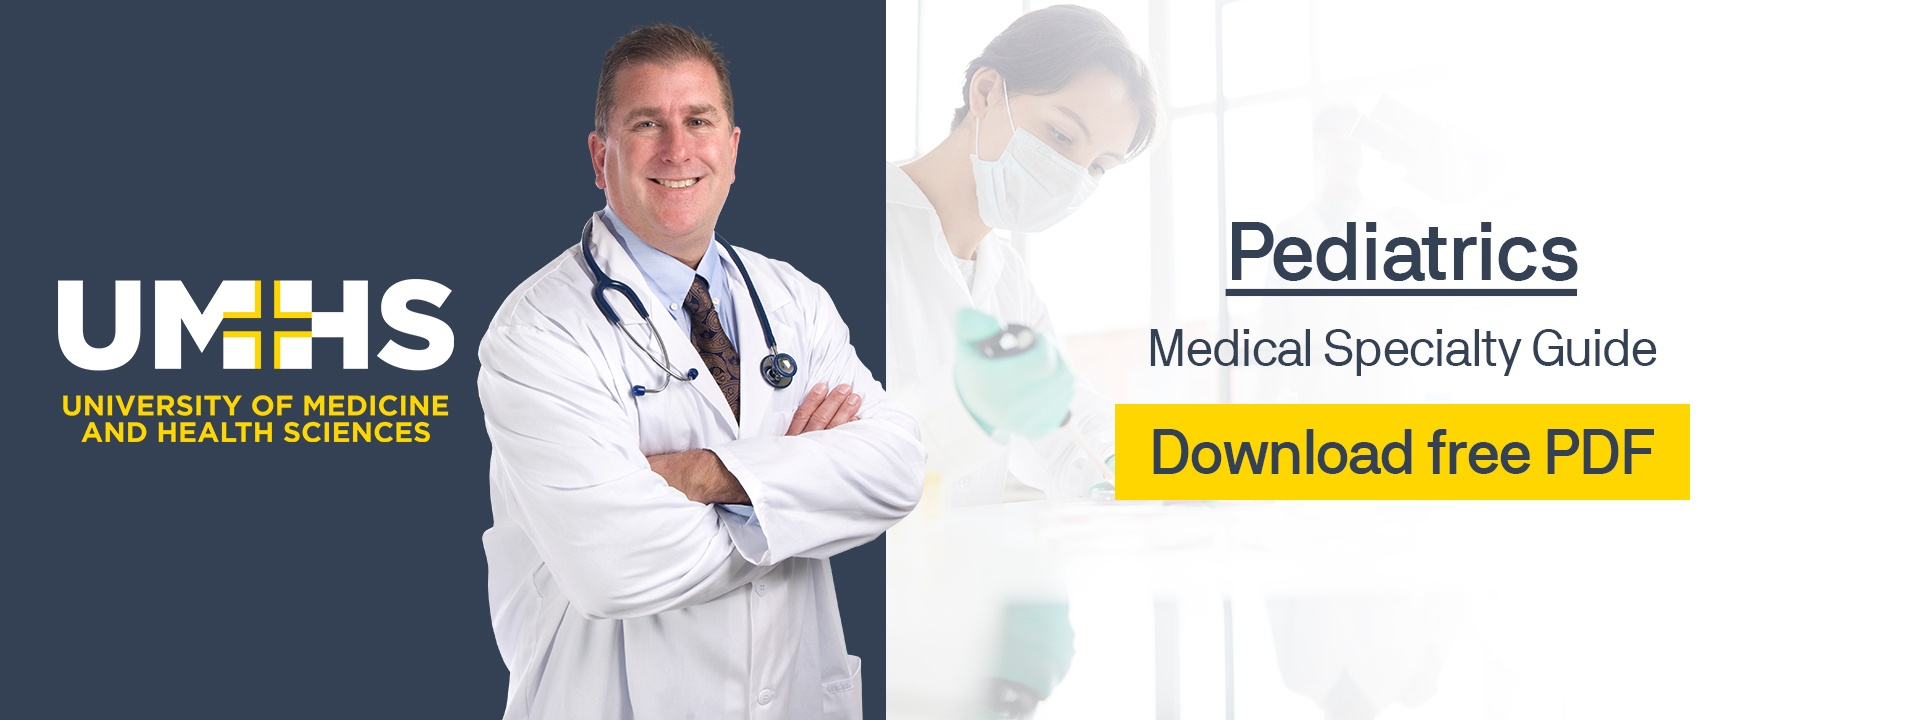 Pediatrics Medical Specialty Guide